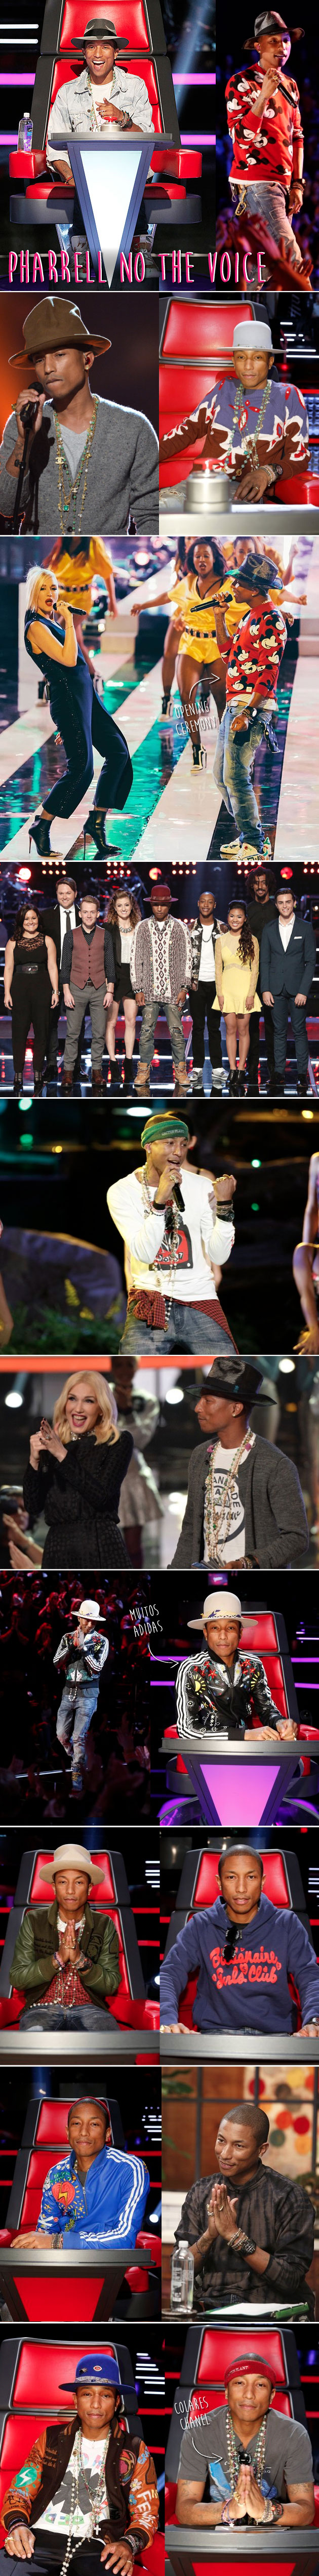 pharrell-williams-the-voice-no-sony-estilo-jaquetas-adidas-colares-chanel-figurino-canal-sony-